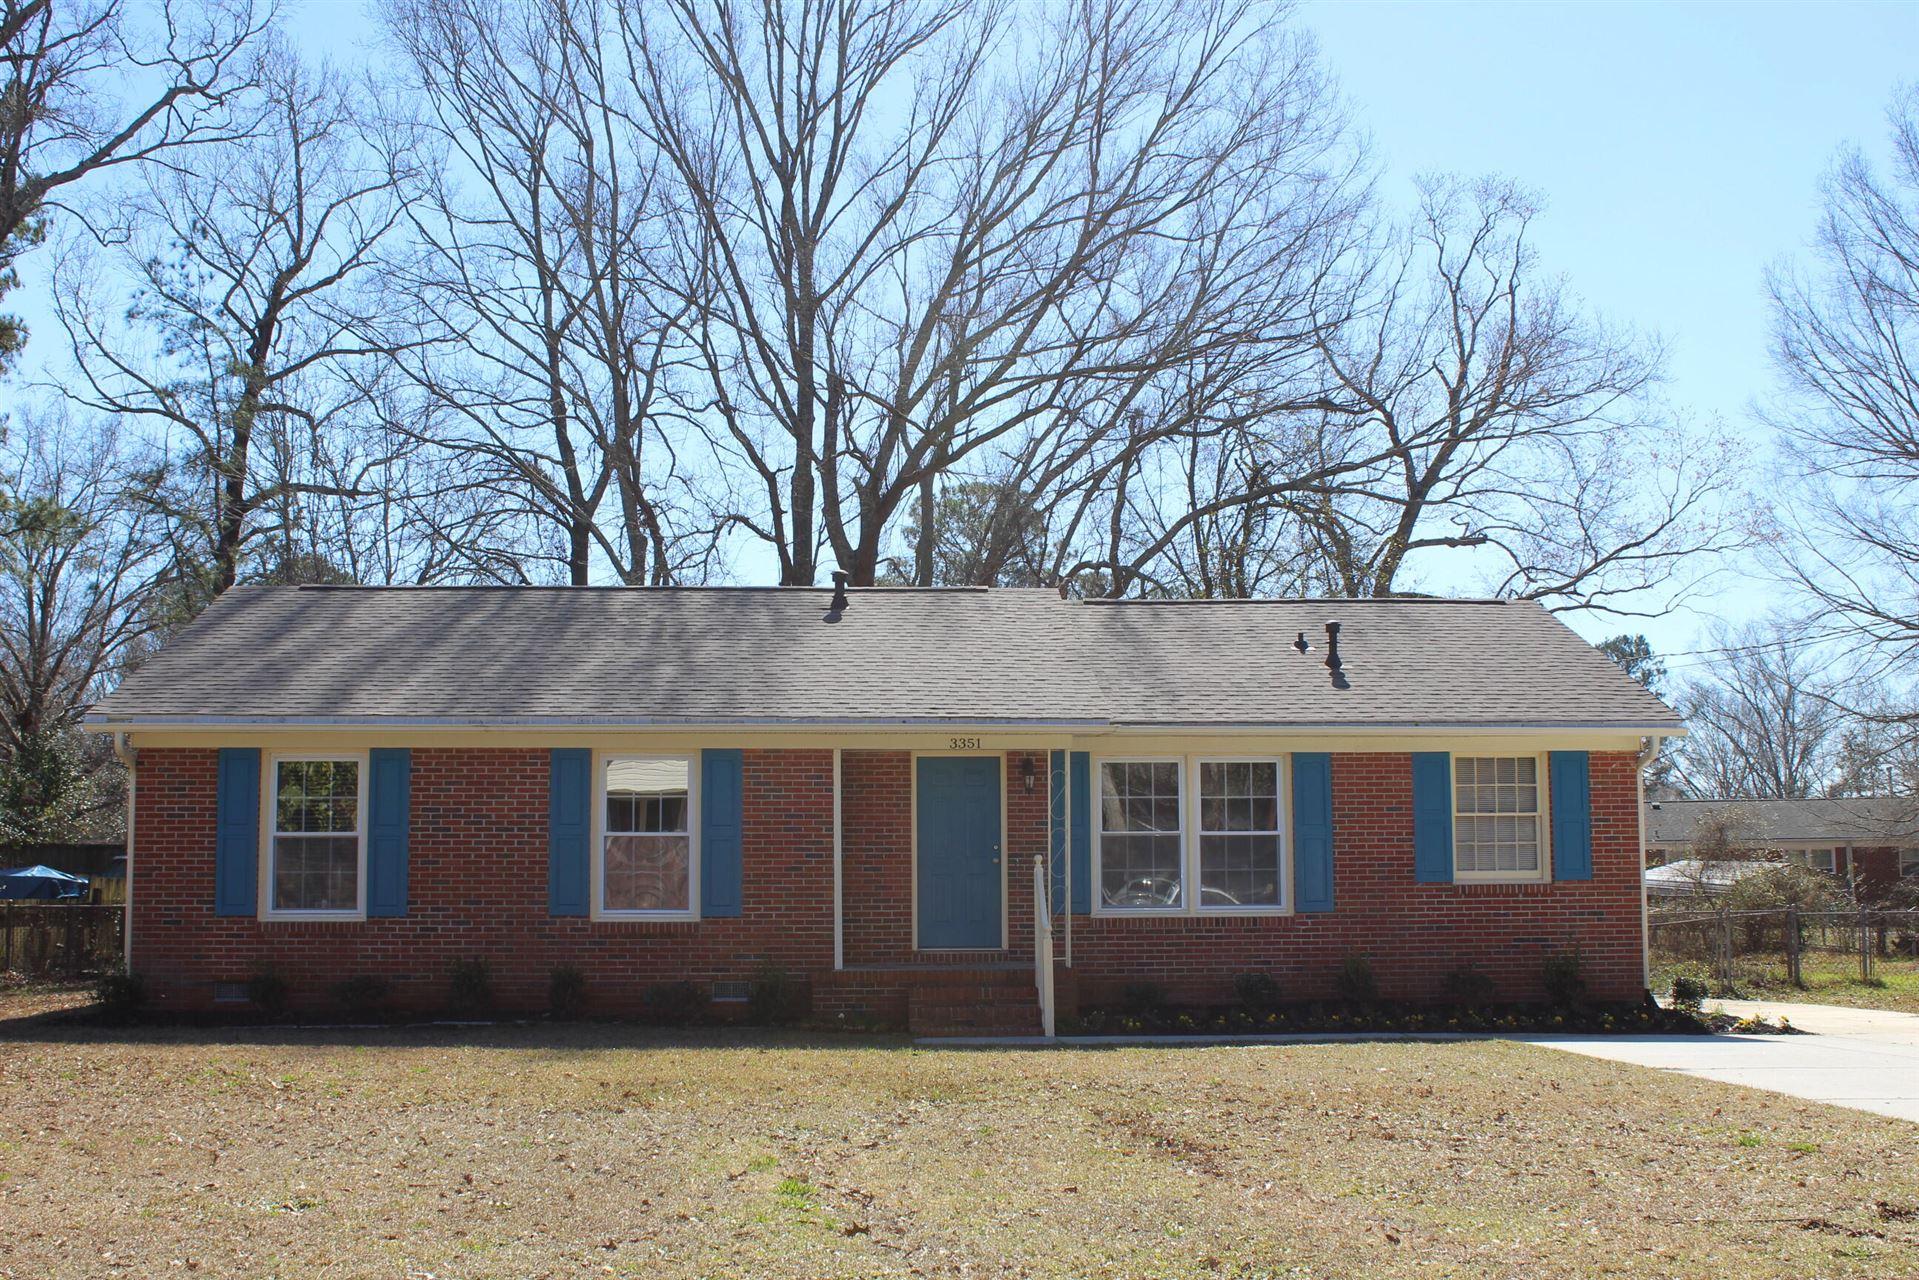 Photo of 3351 Londonderry Road, North Charleston, SC 29420 (MLS # 21004825)